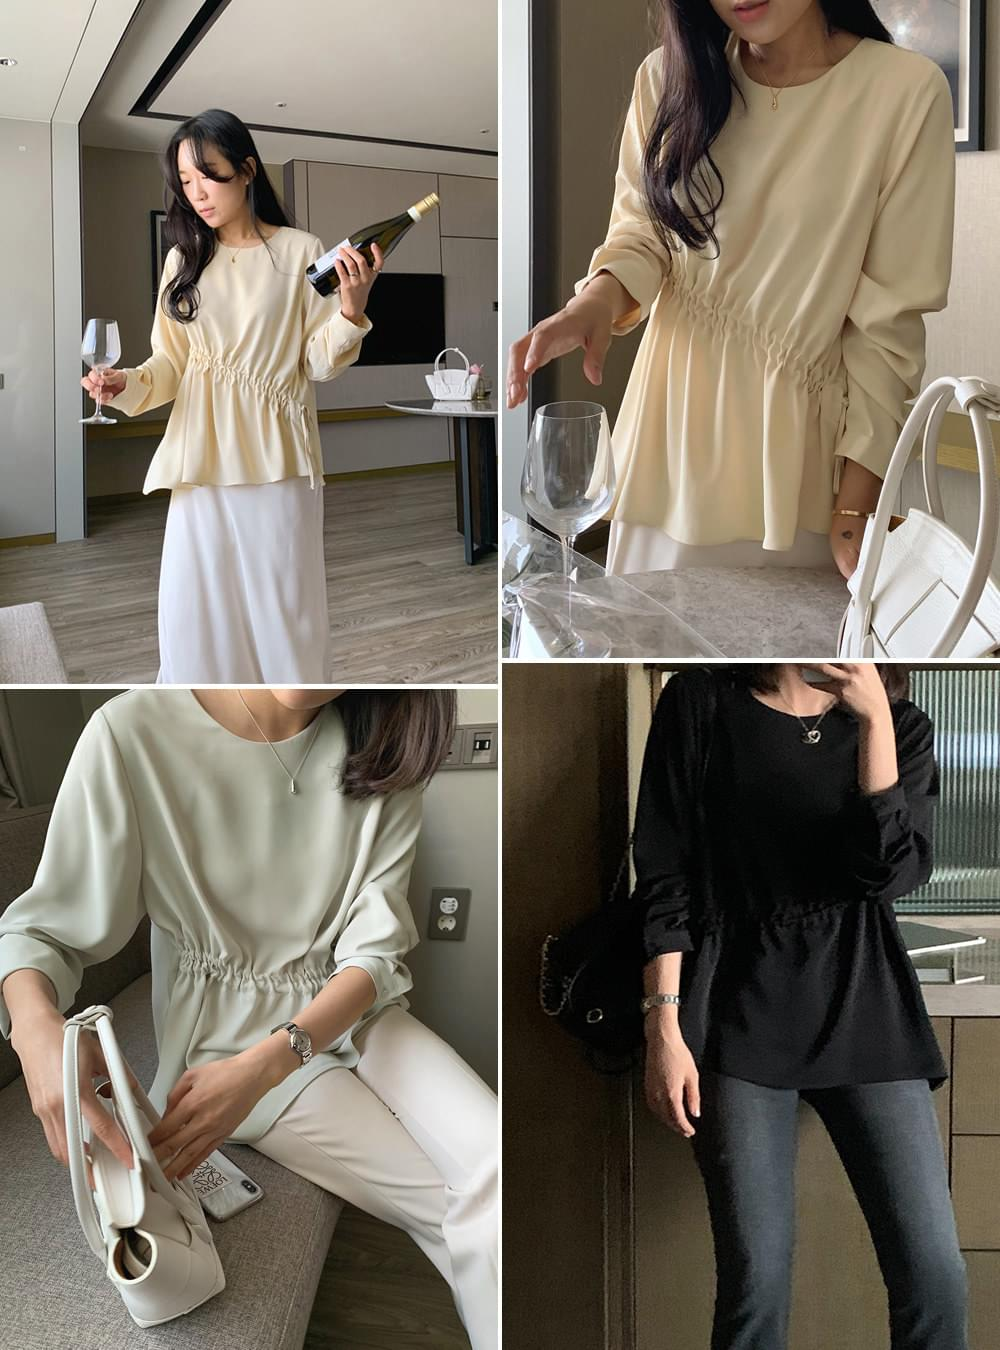 My-littleclassic/ Charni front shirred blouse